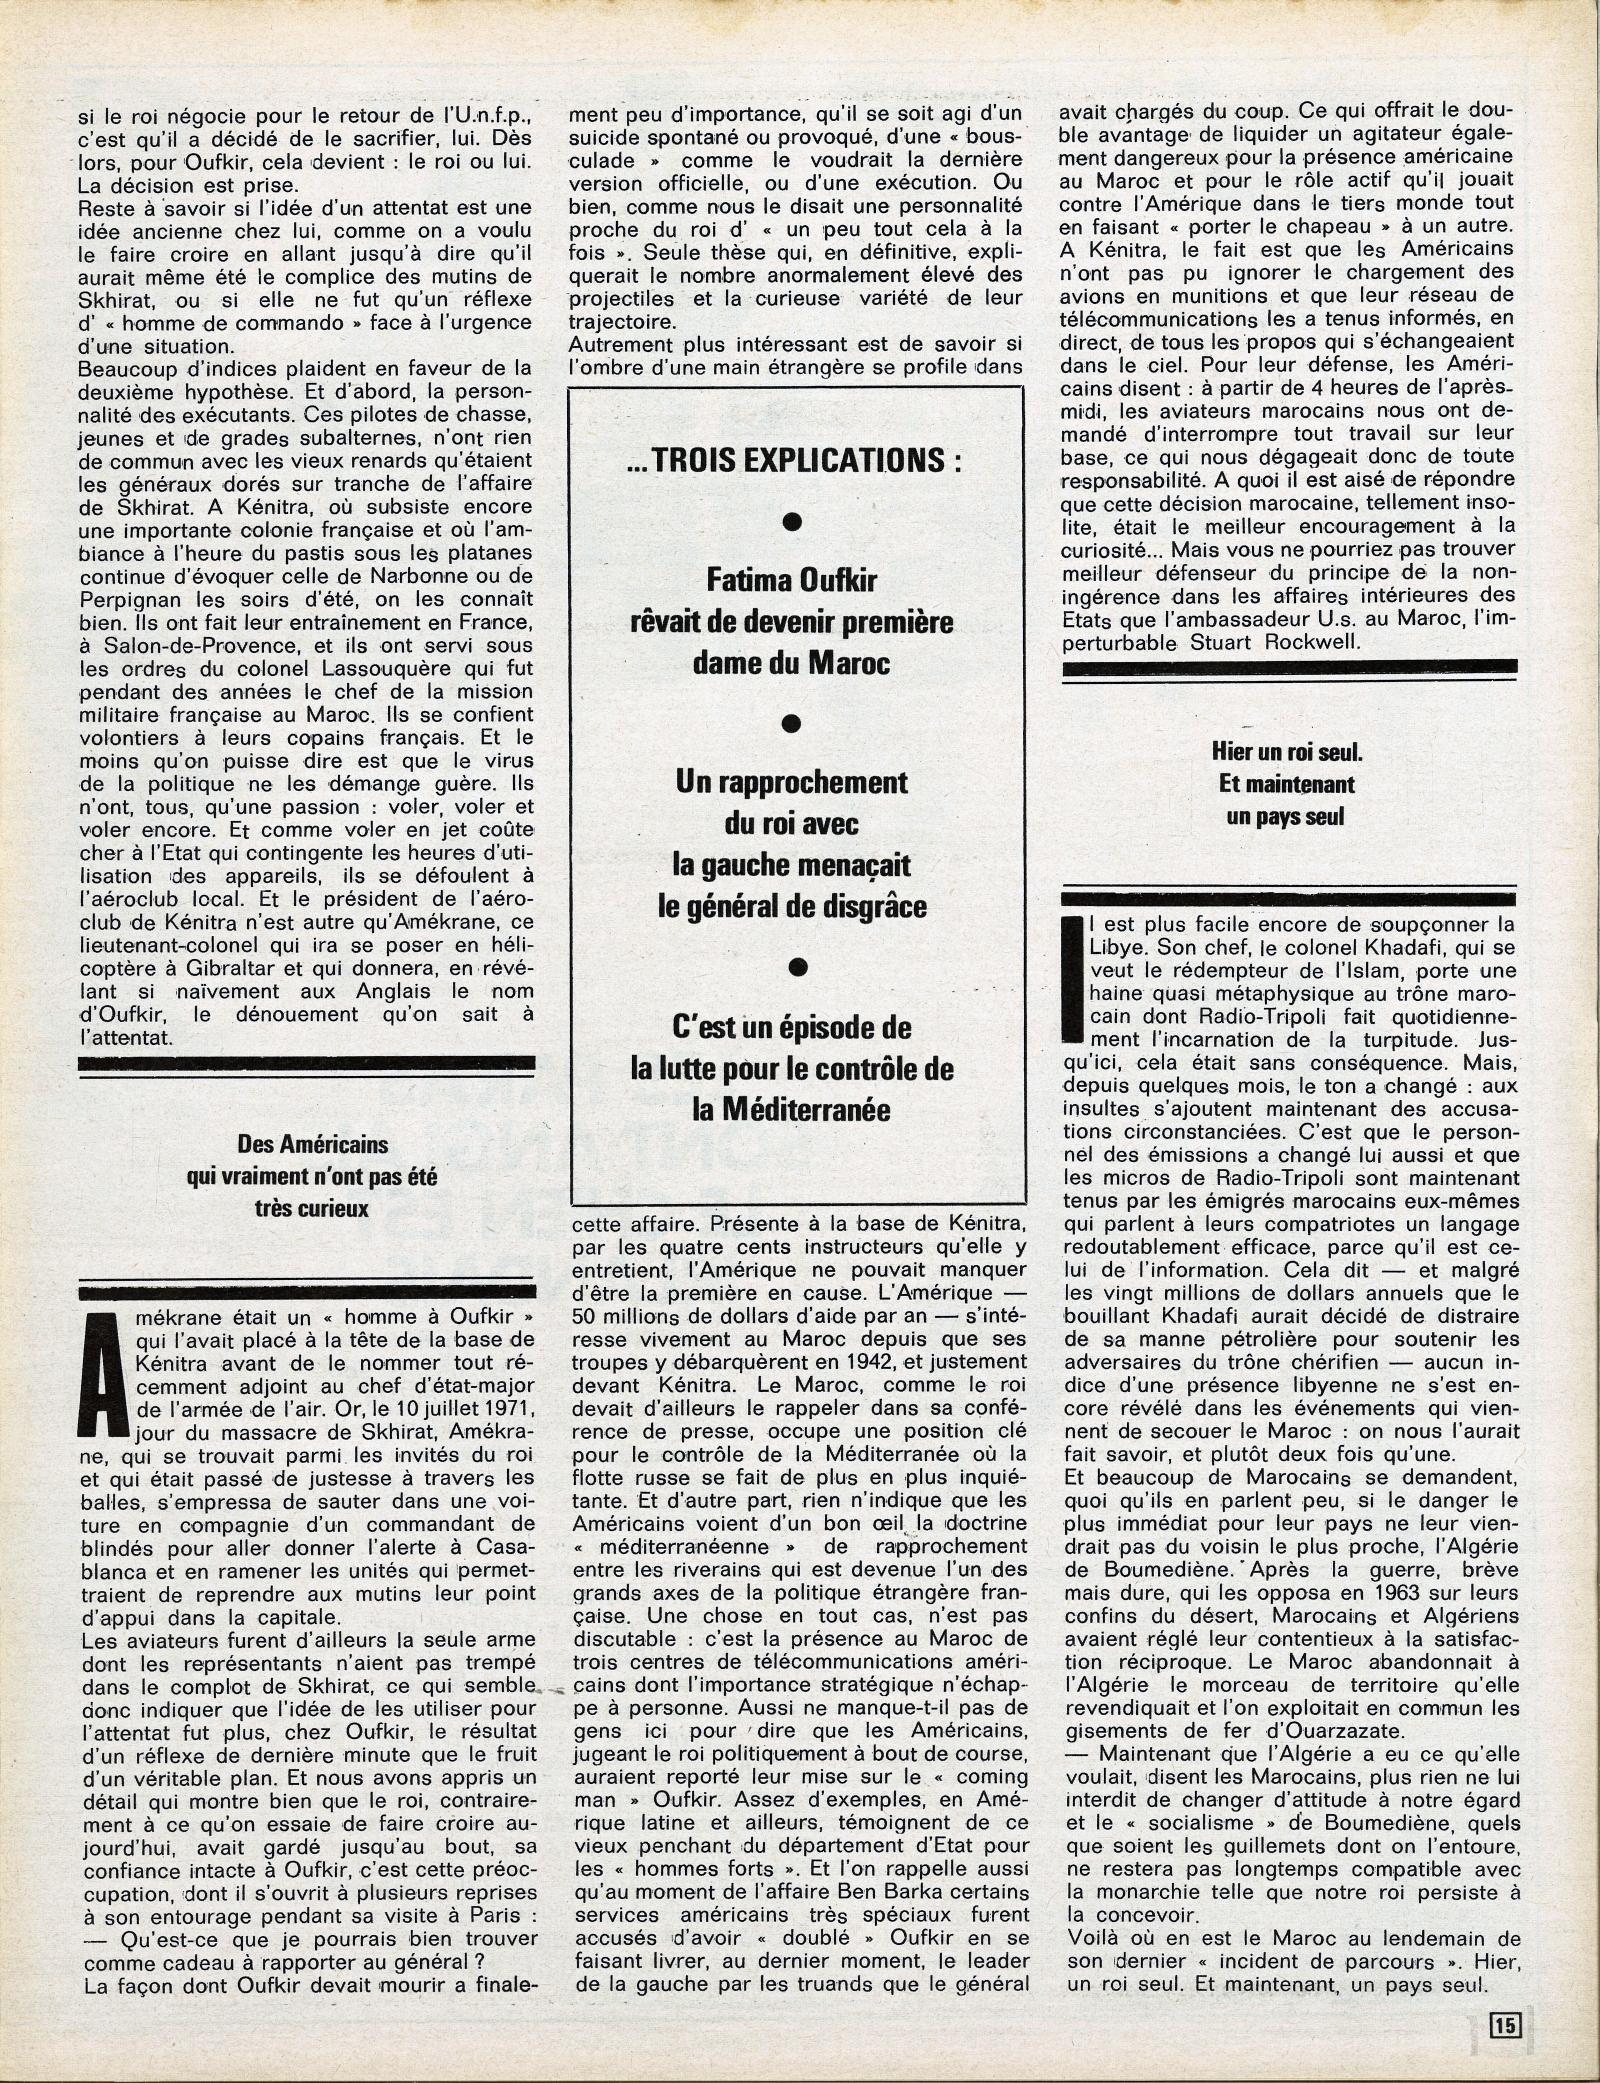 Tentative de coup d'État Boeing Royal vs F-5A/B Opération Borak le 16 août 1972 35998255361_7db992f47c_o